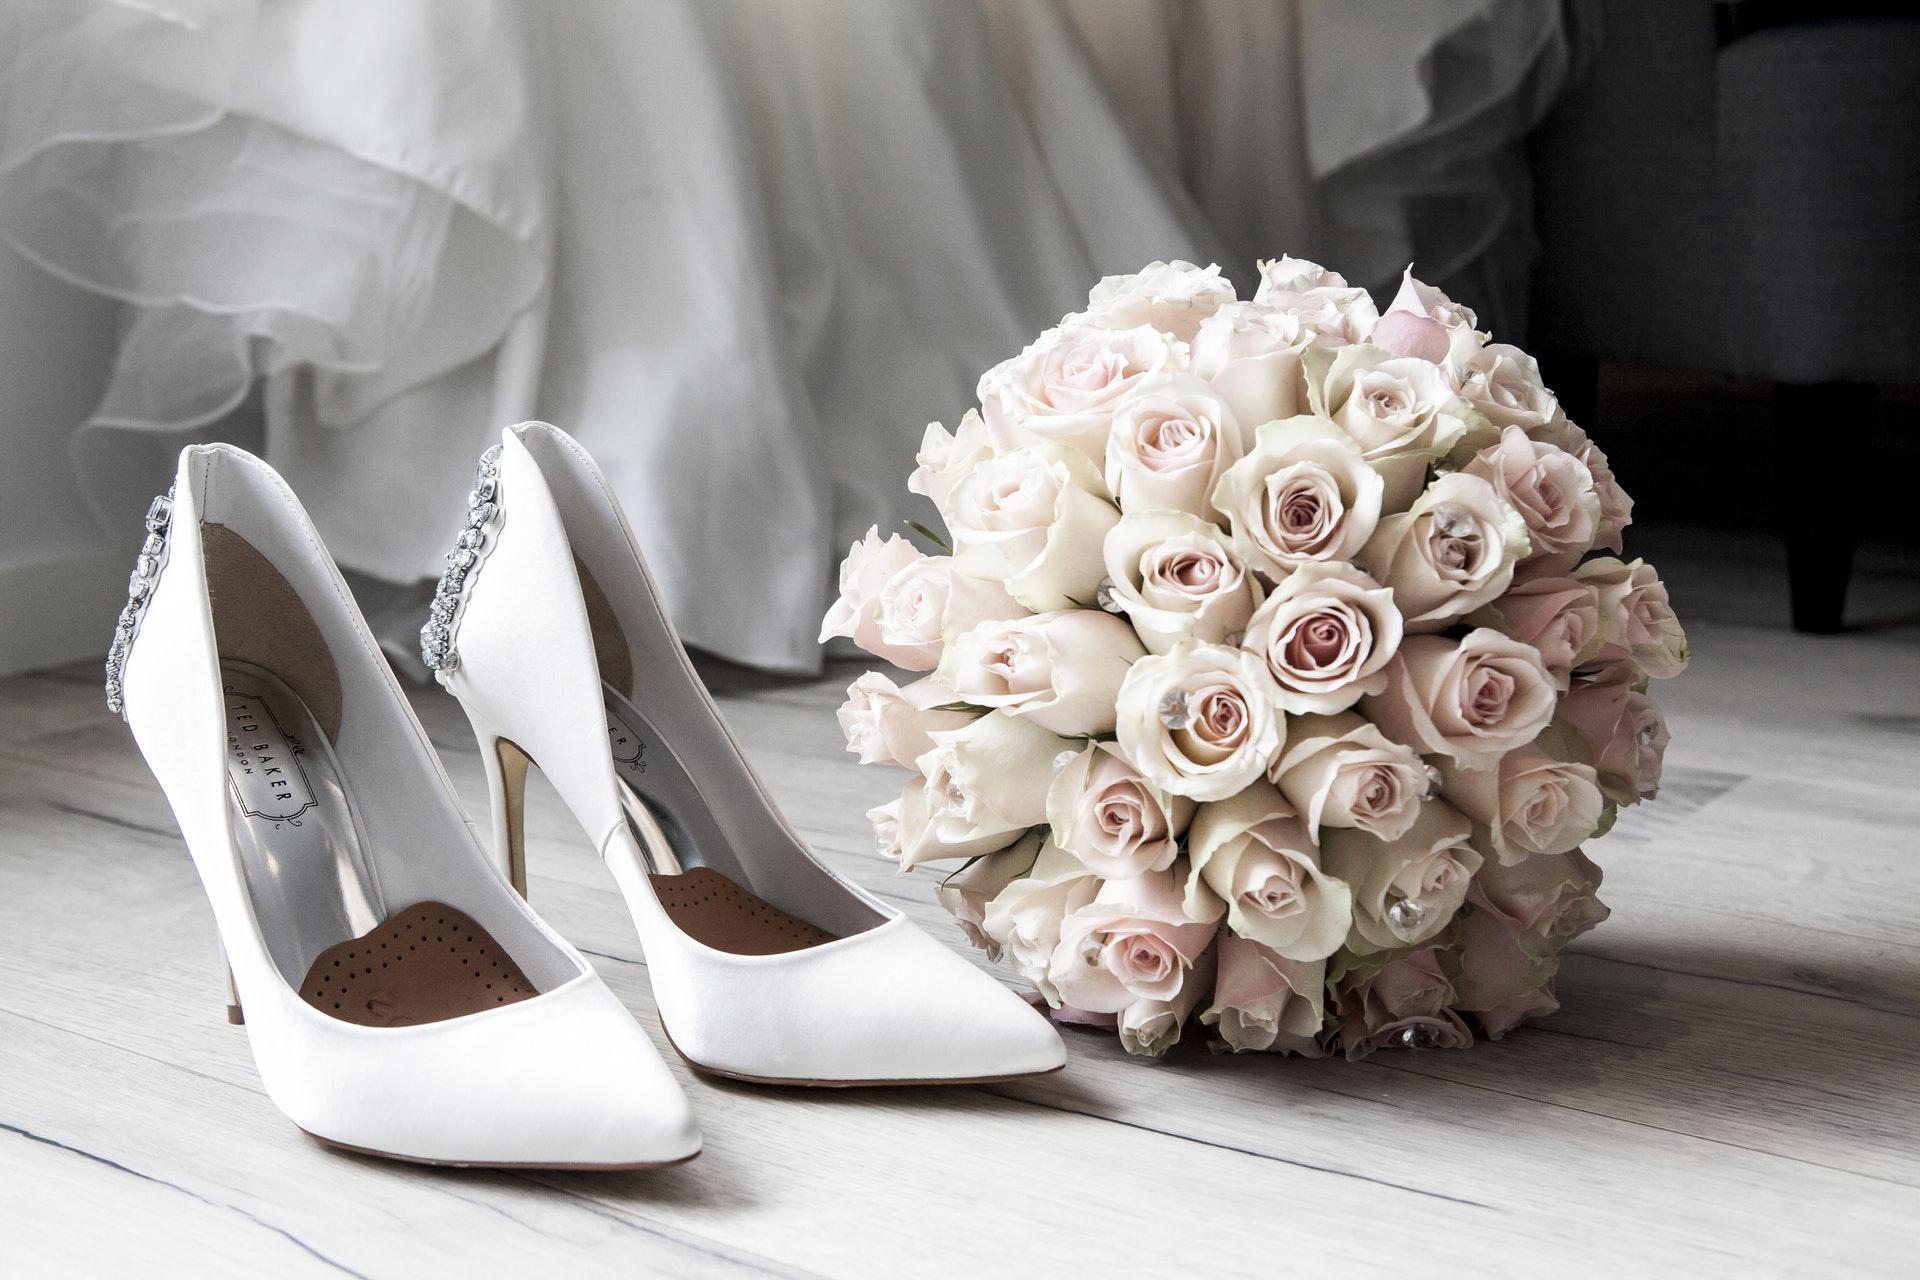 بالصور صور ورد جميل , اجمل صور لبوكيه الورد